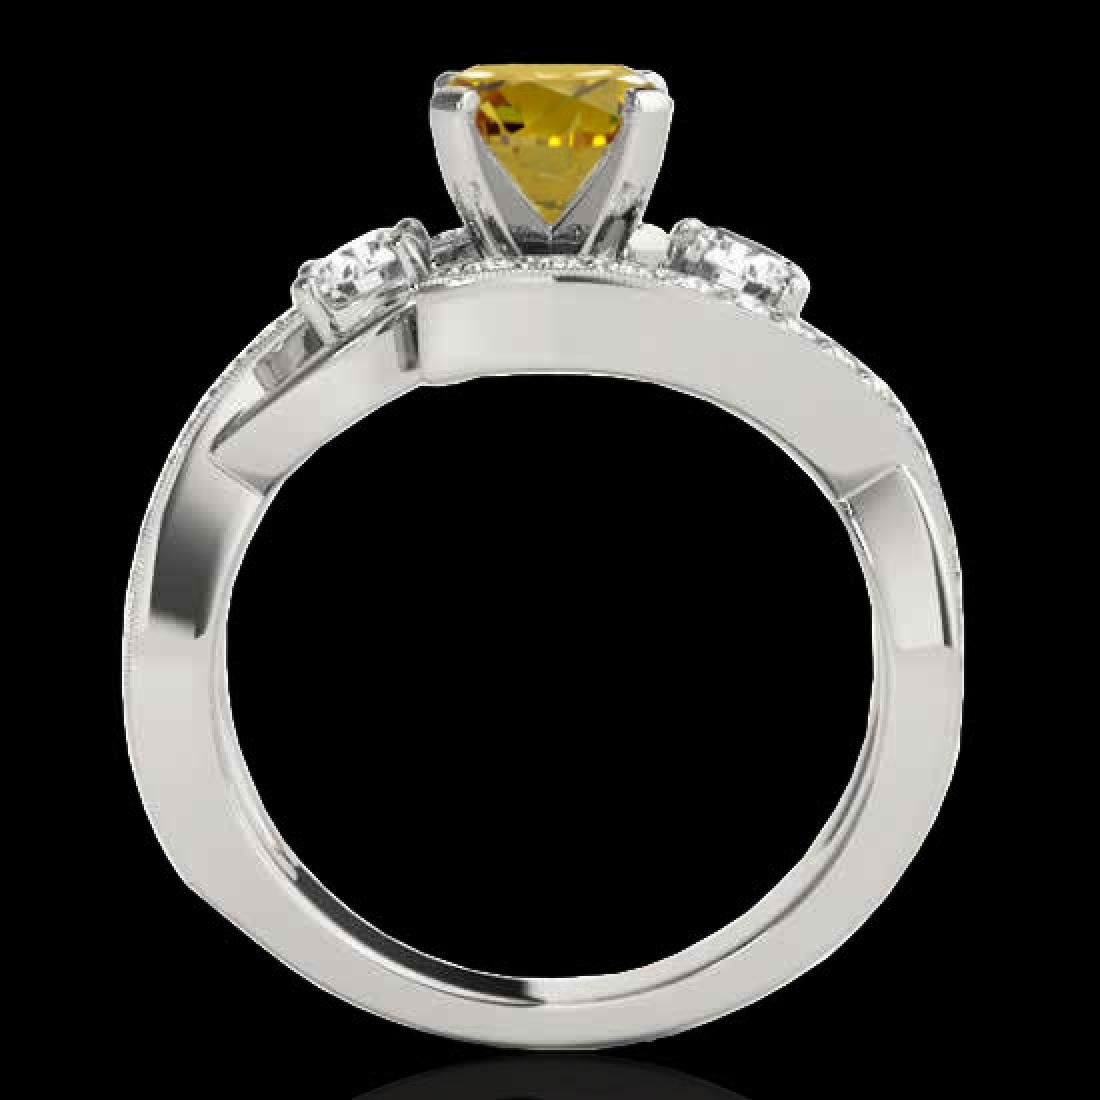 2.26 CTW Certified Si Intense Yellow Diamond Bypass - 2